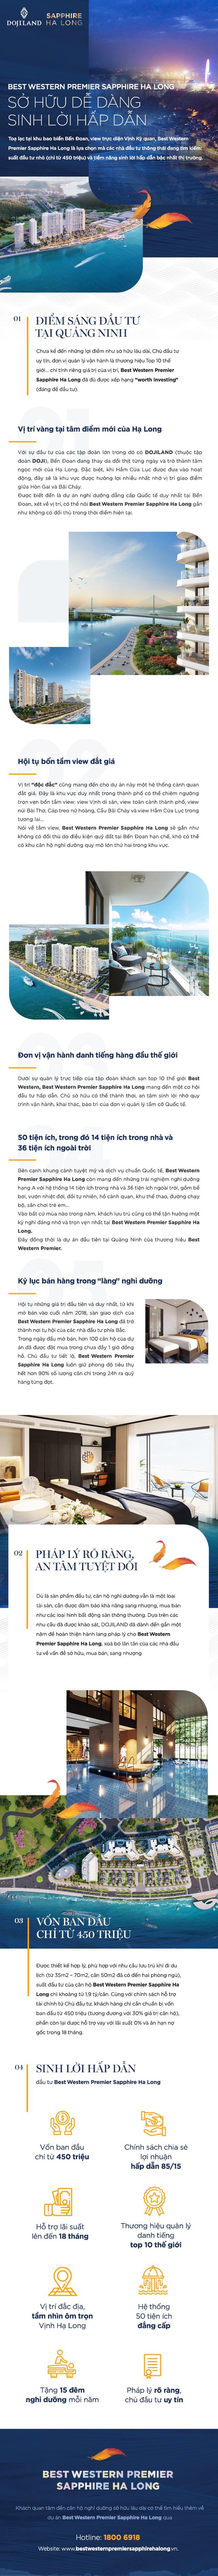 Best Western Premier Sapphire Ha Long: Sở hữu dễ dàng - Sinh lời chắc chắn - 1